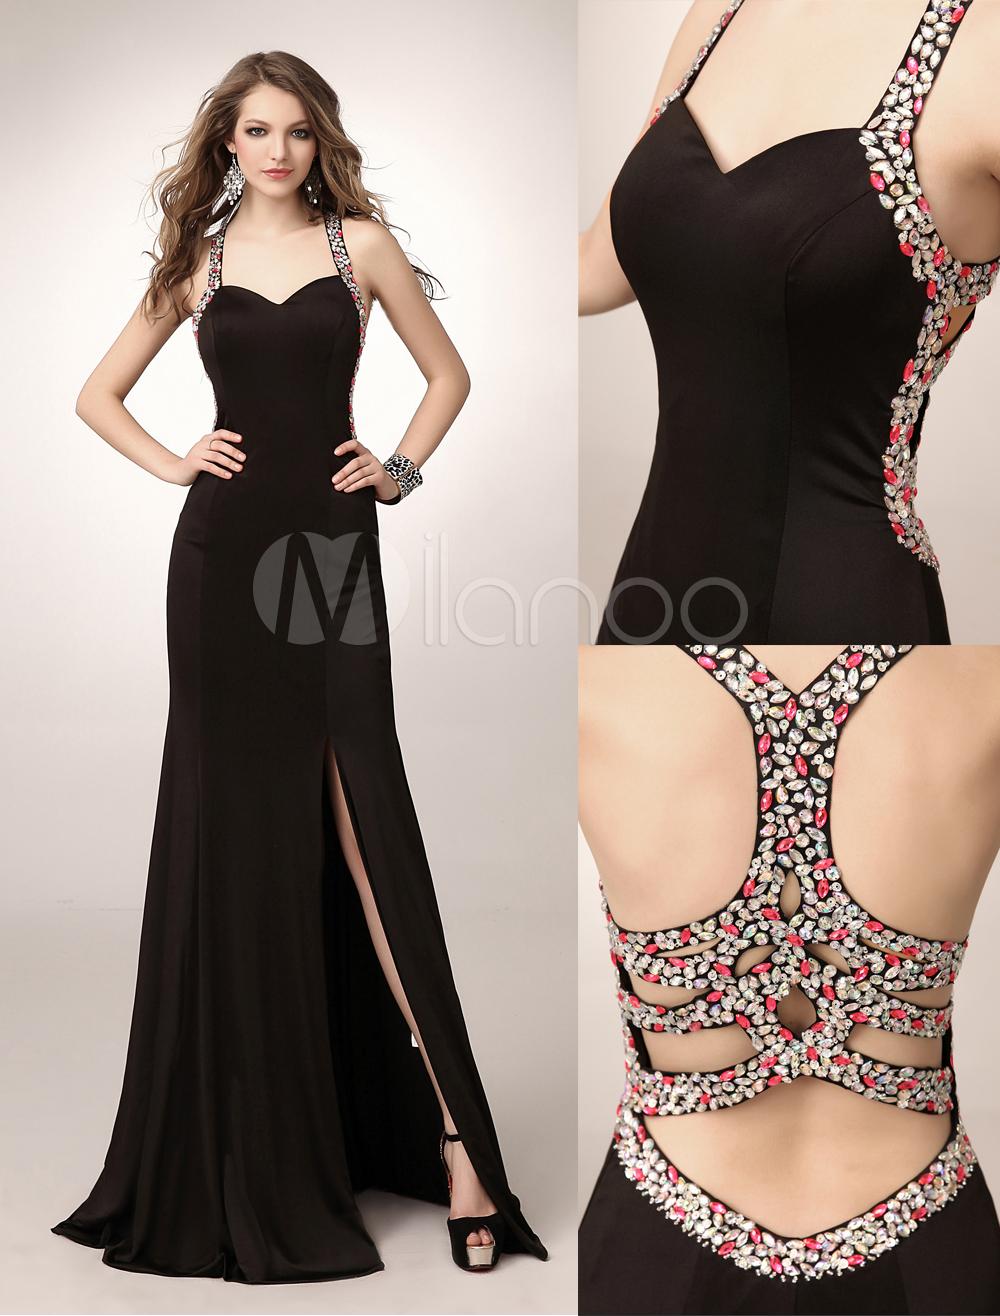 084dd6b7da1 Another beautiful prom-style dress from Milanoo. Black Rhinestone Mermaid  ...